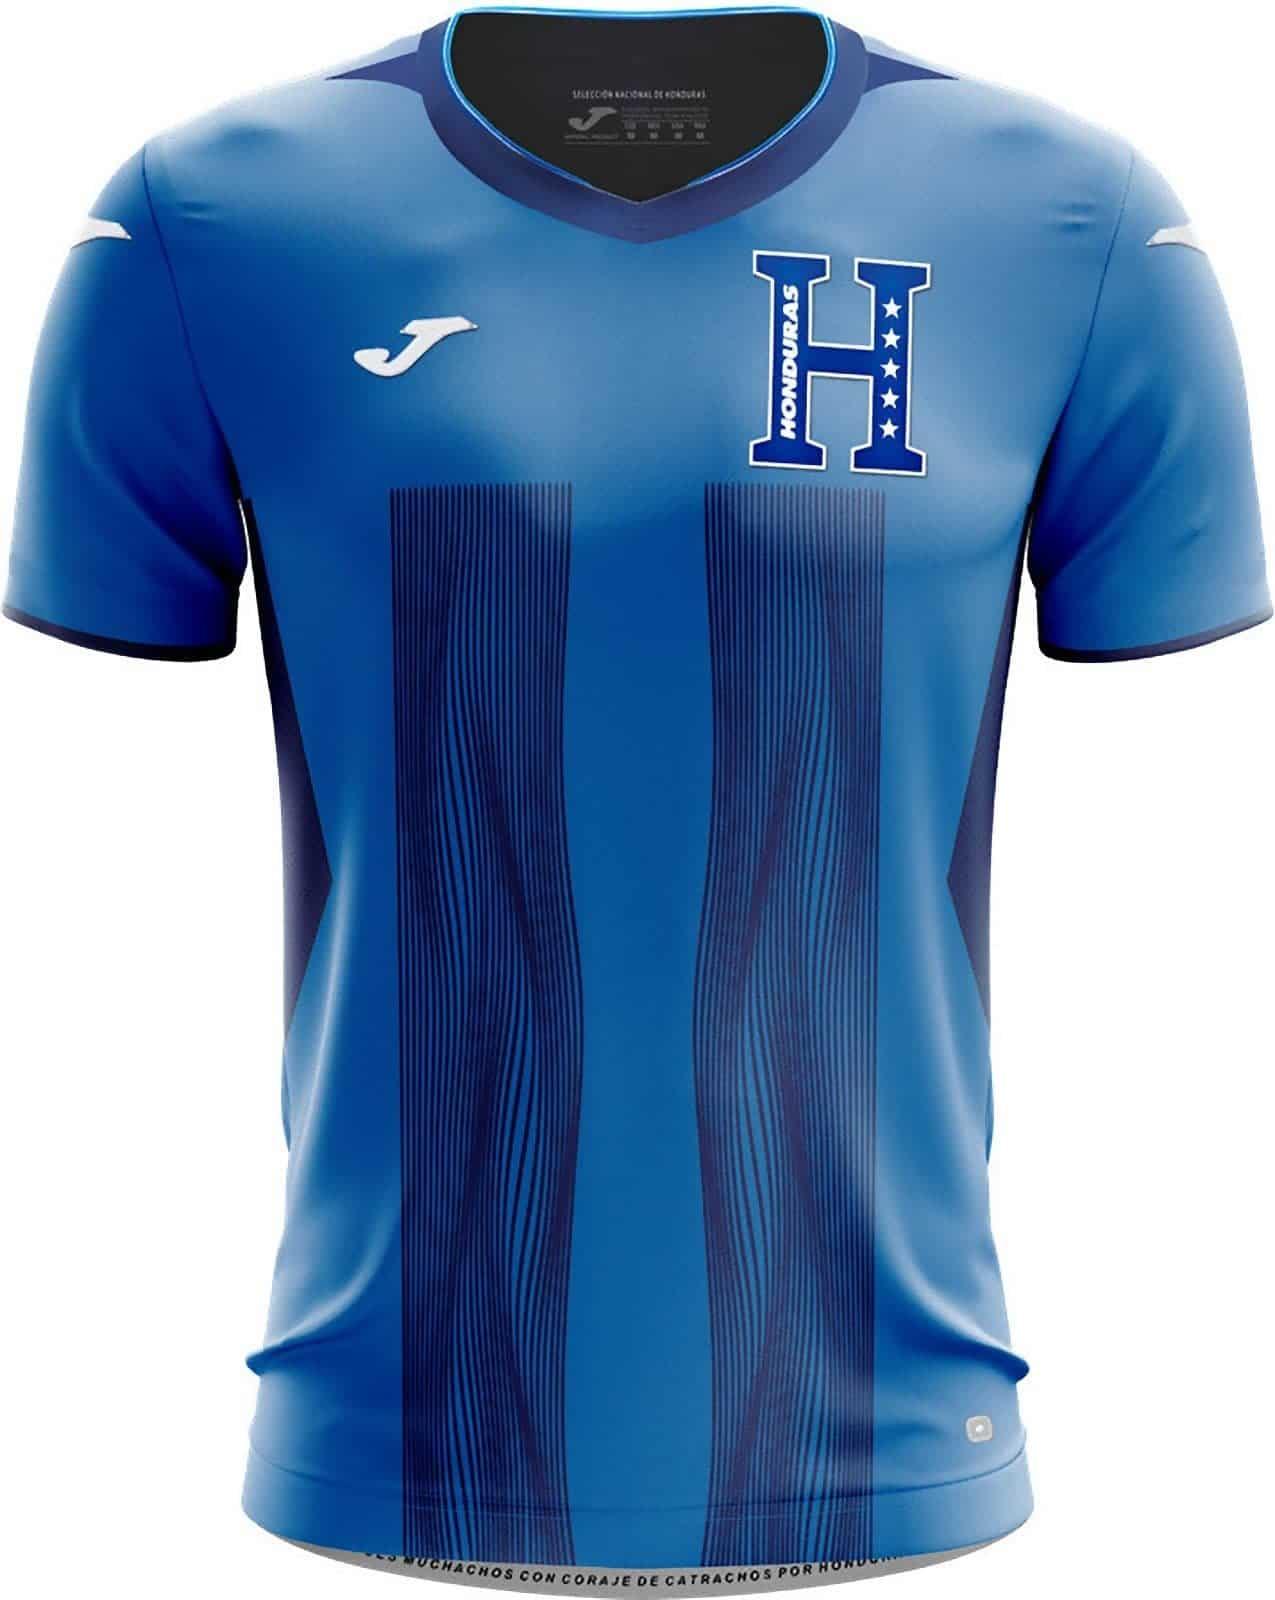 Honduras 2019 Joma Kits Released The Kitman